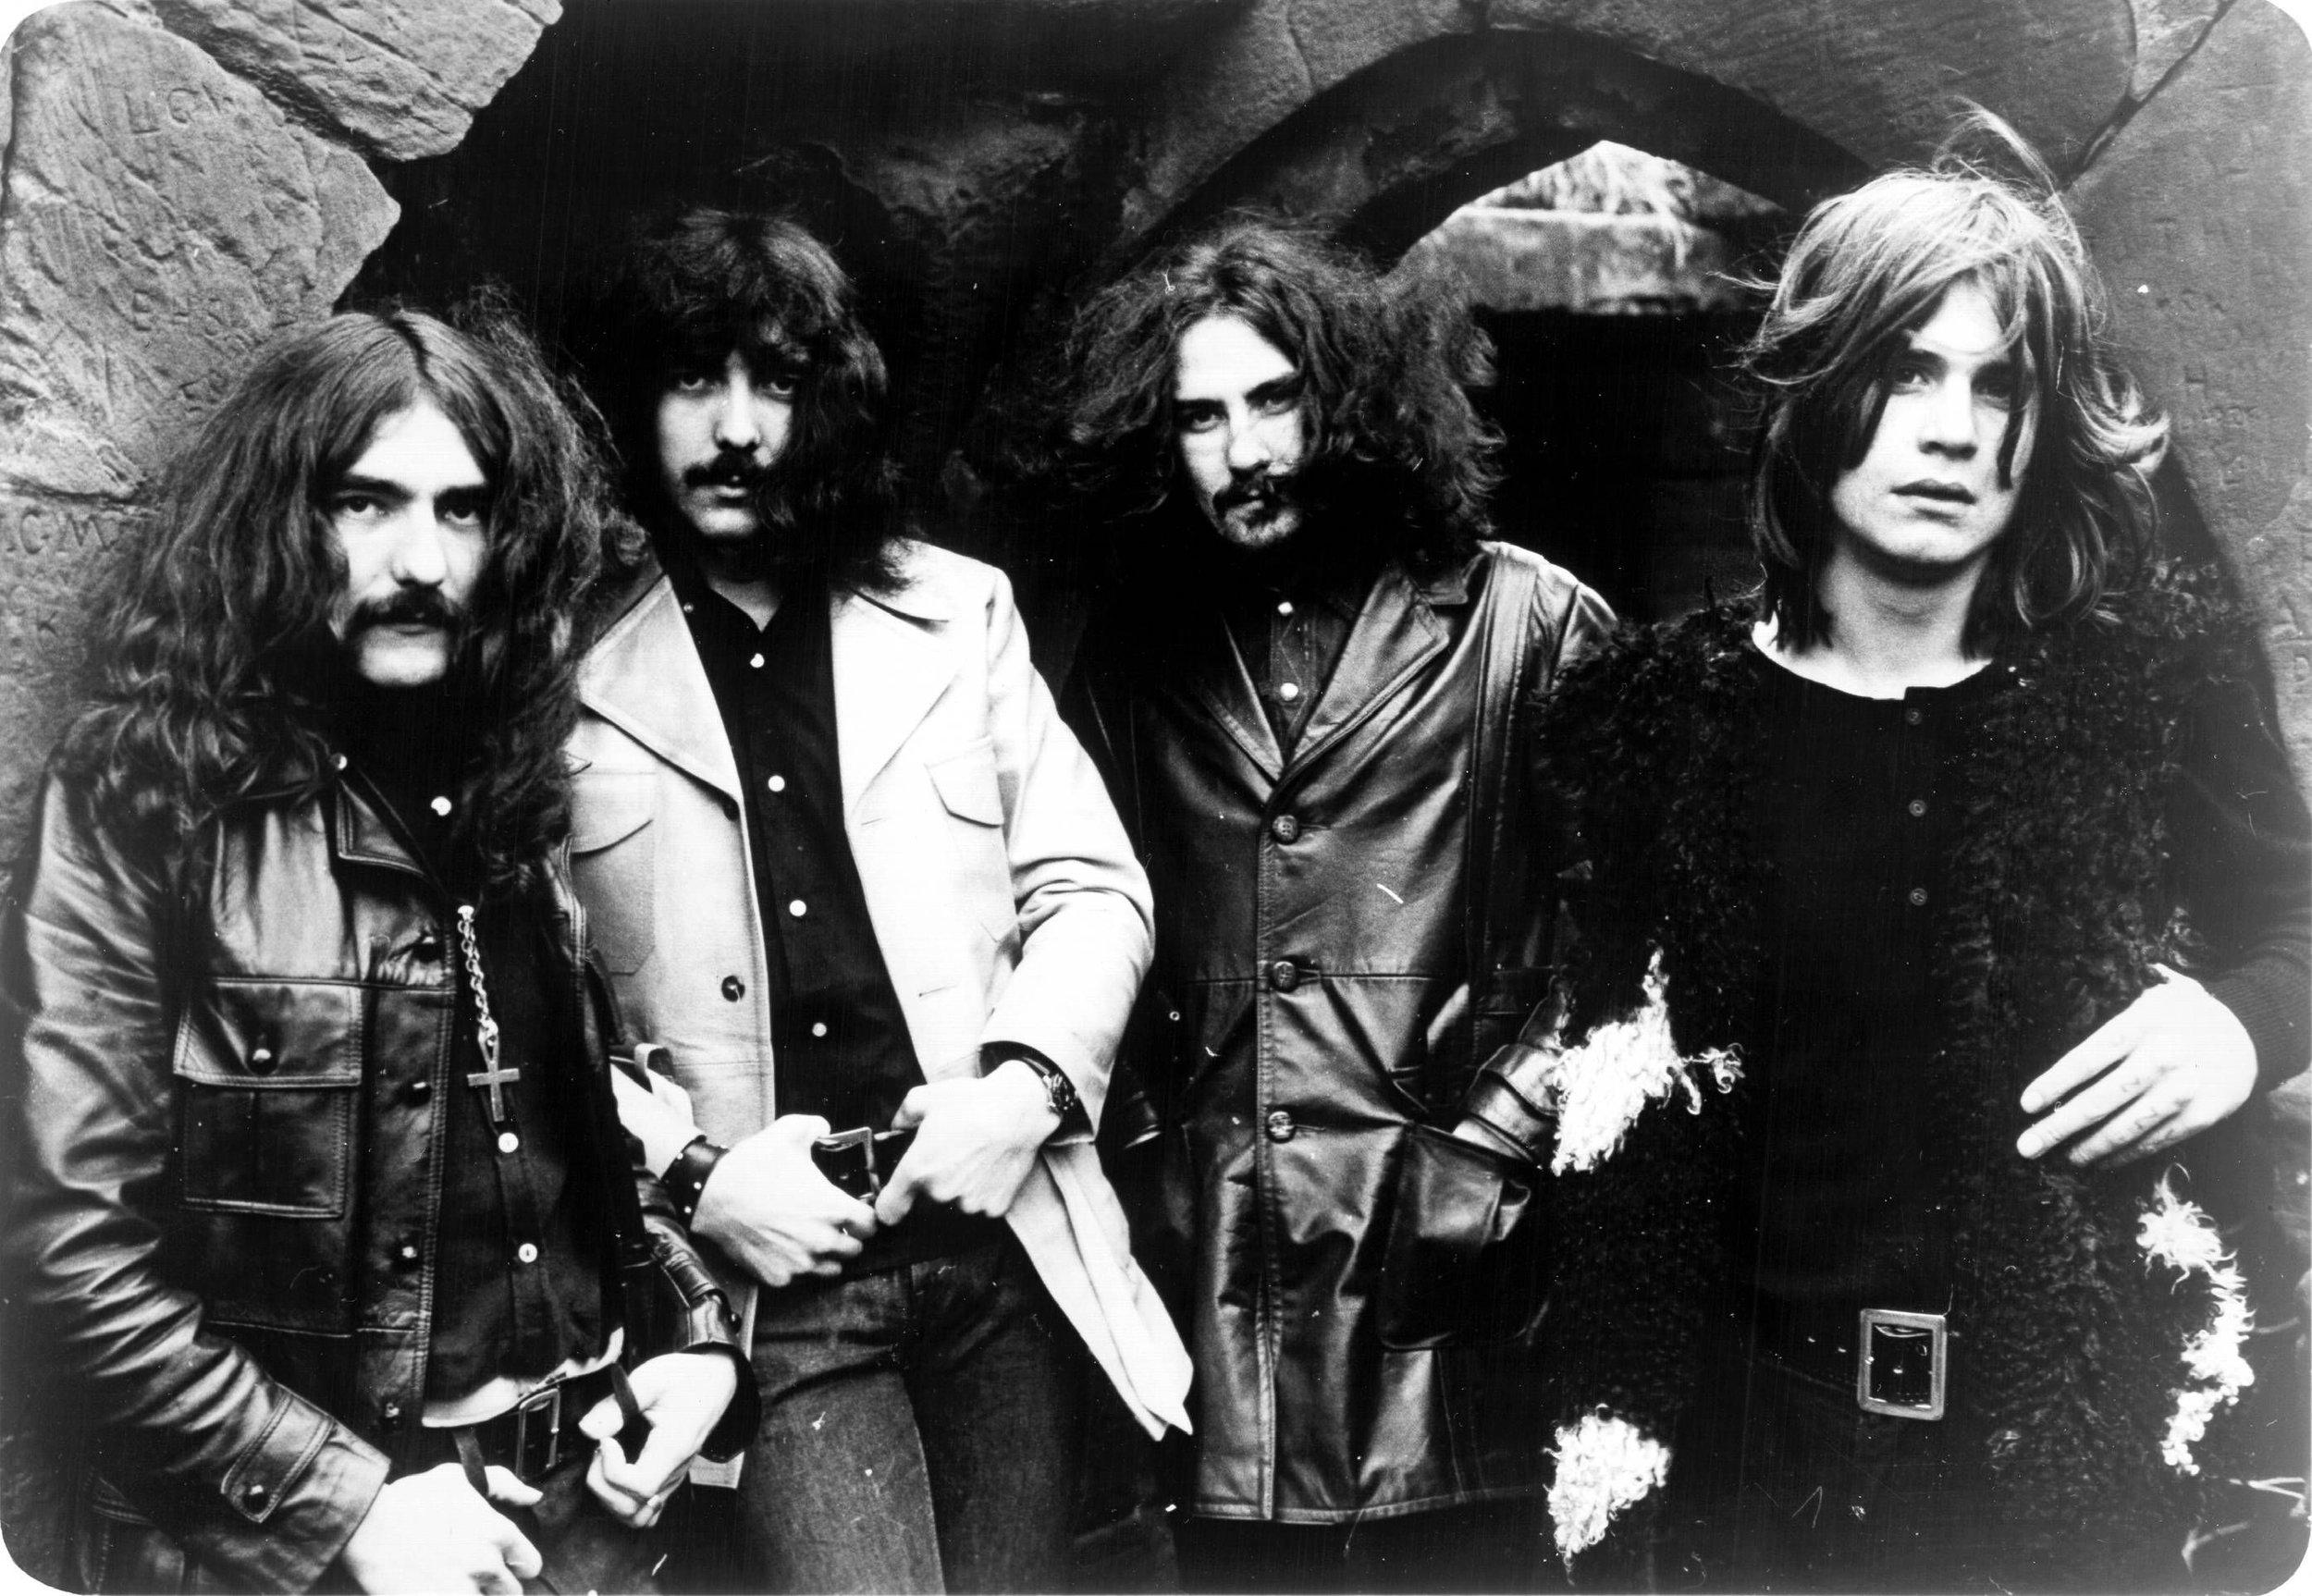 Black Sabbath circa 1970. L to R: Geezer Butler, Tony Iommi, Bill Ward, Ozzy Osbourne.